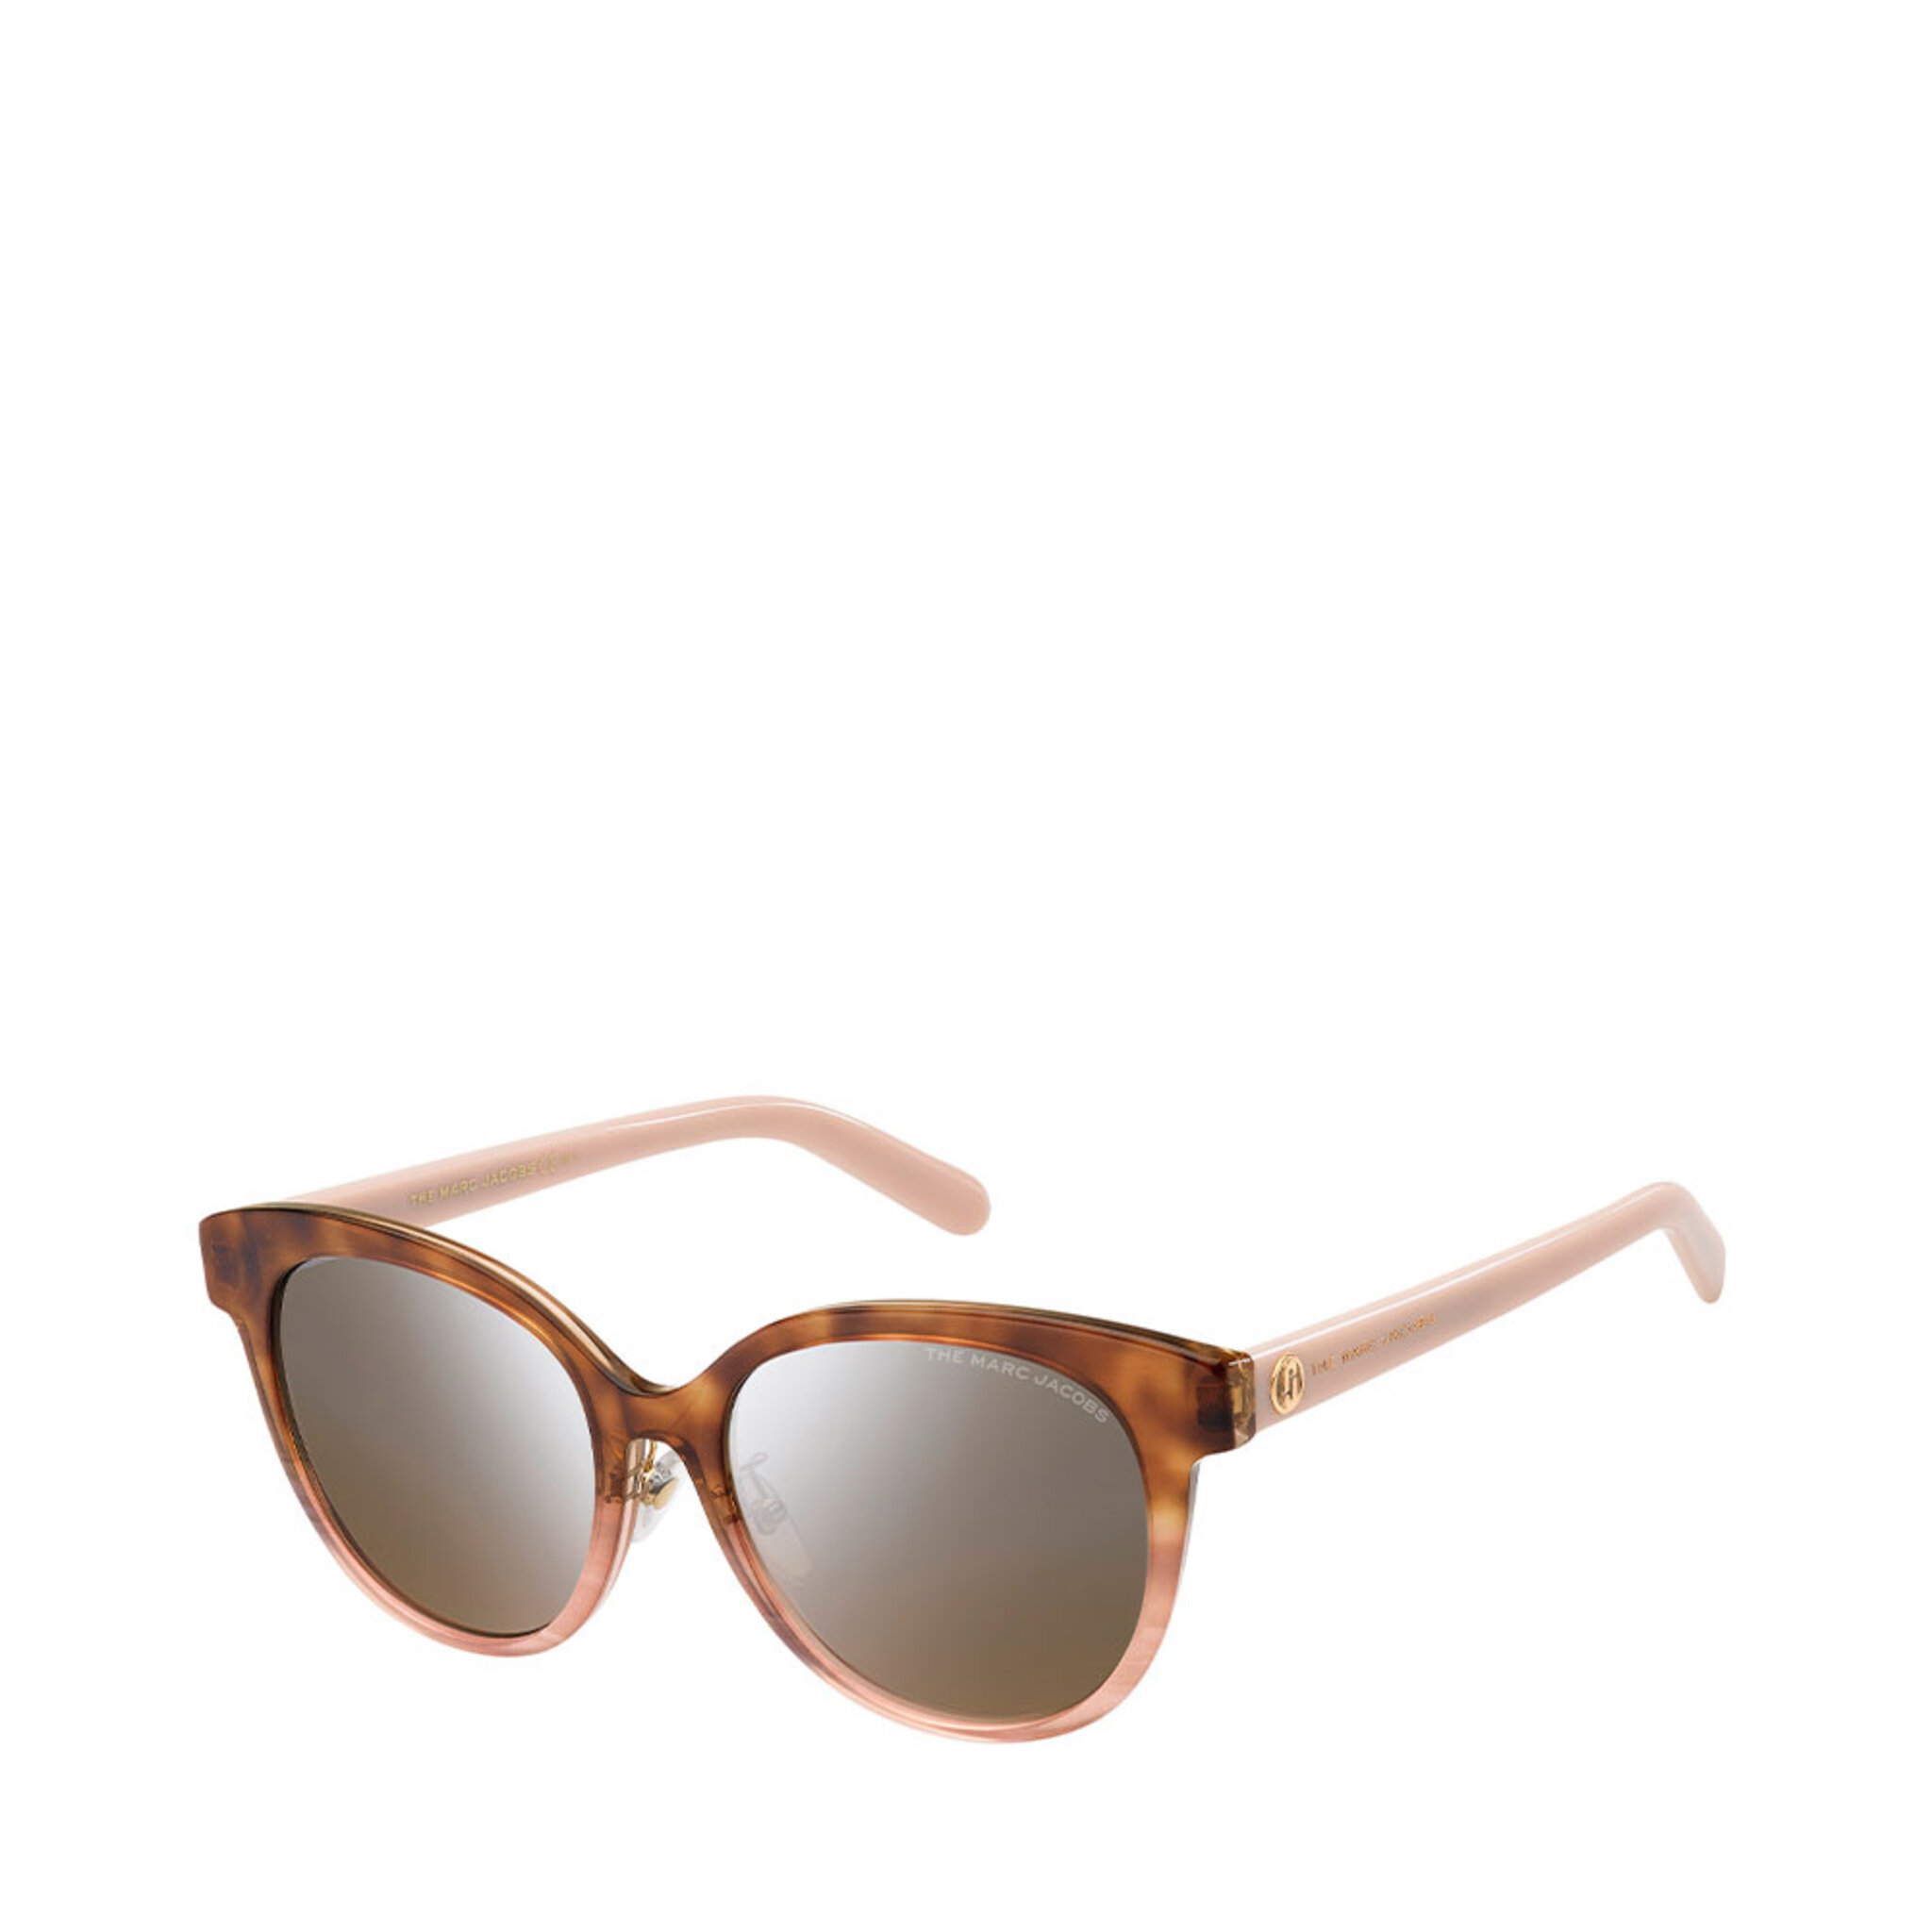 Sunglasses MARC 551/G/S